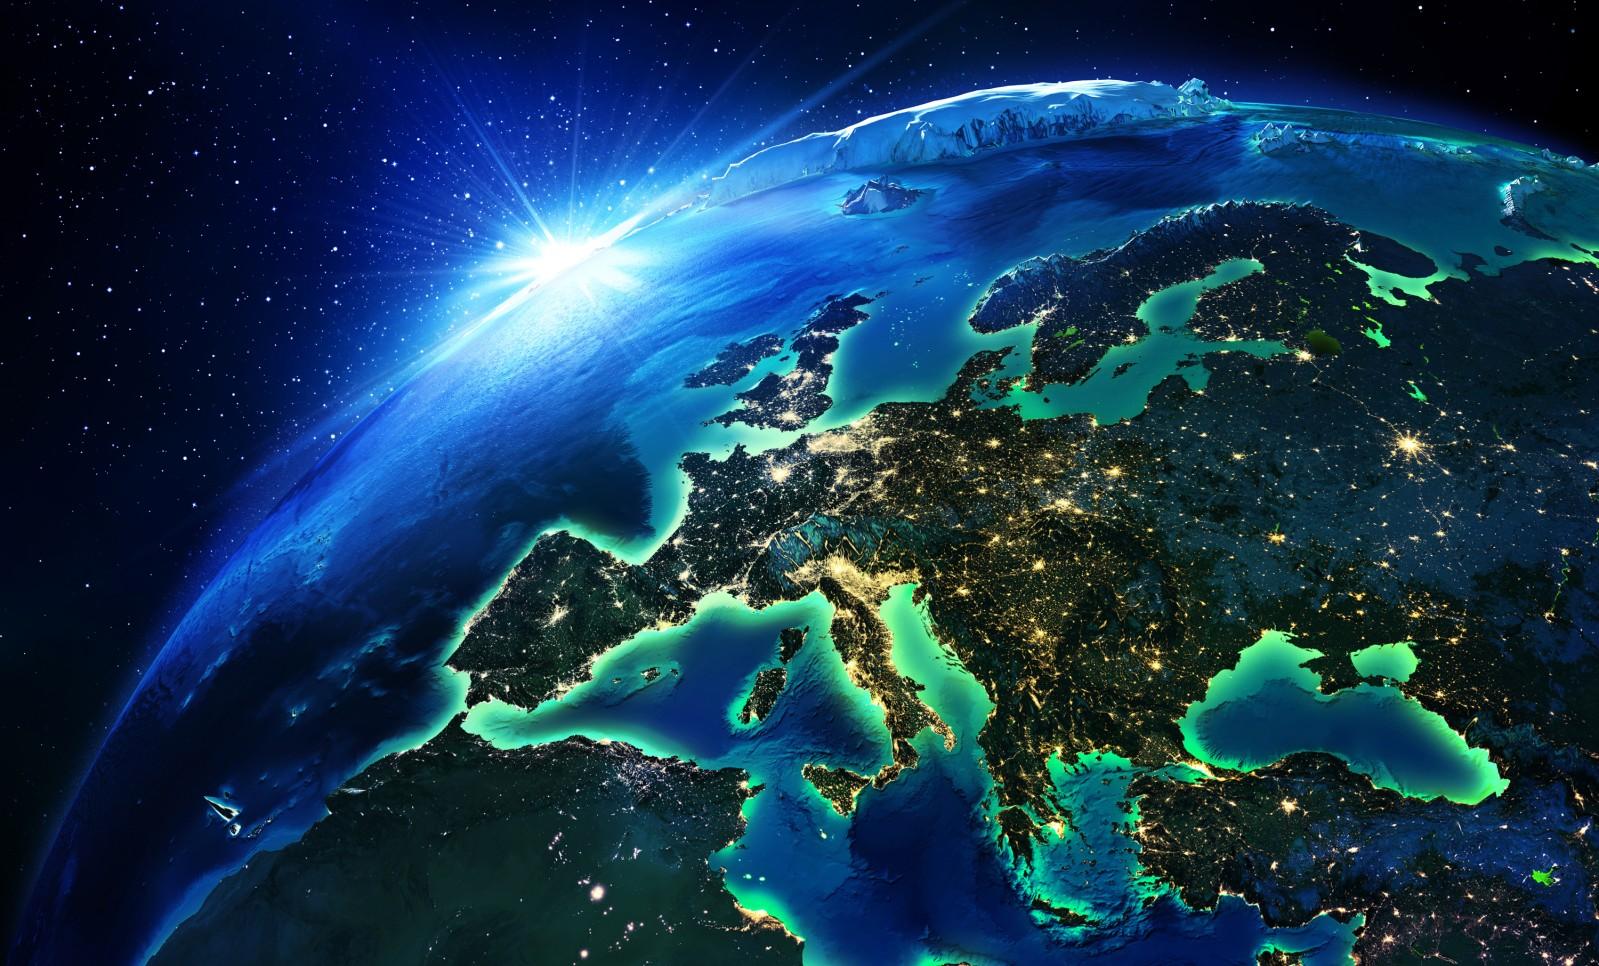 Earth hour 2015 samstag 28 m rz 2015 for Sfondi spazio hd